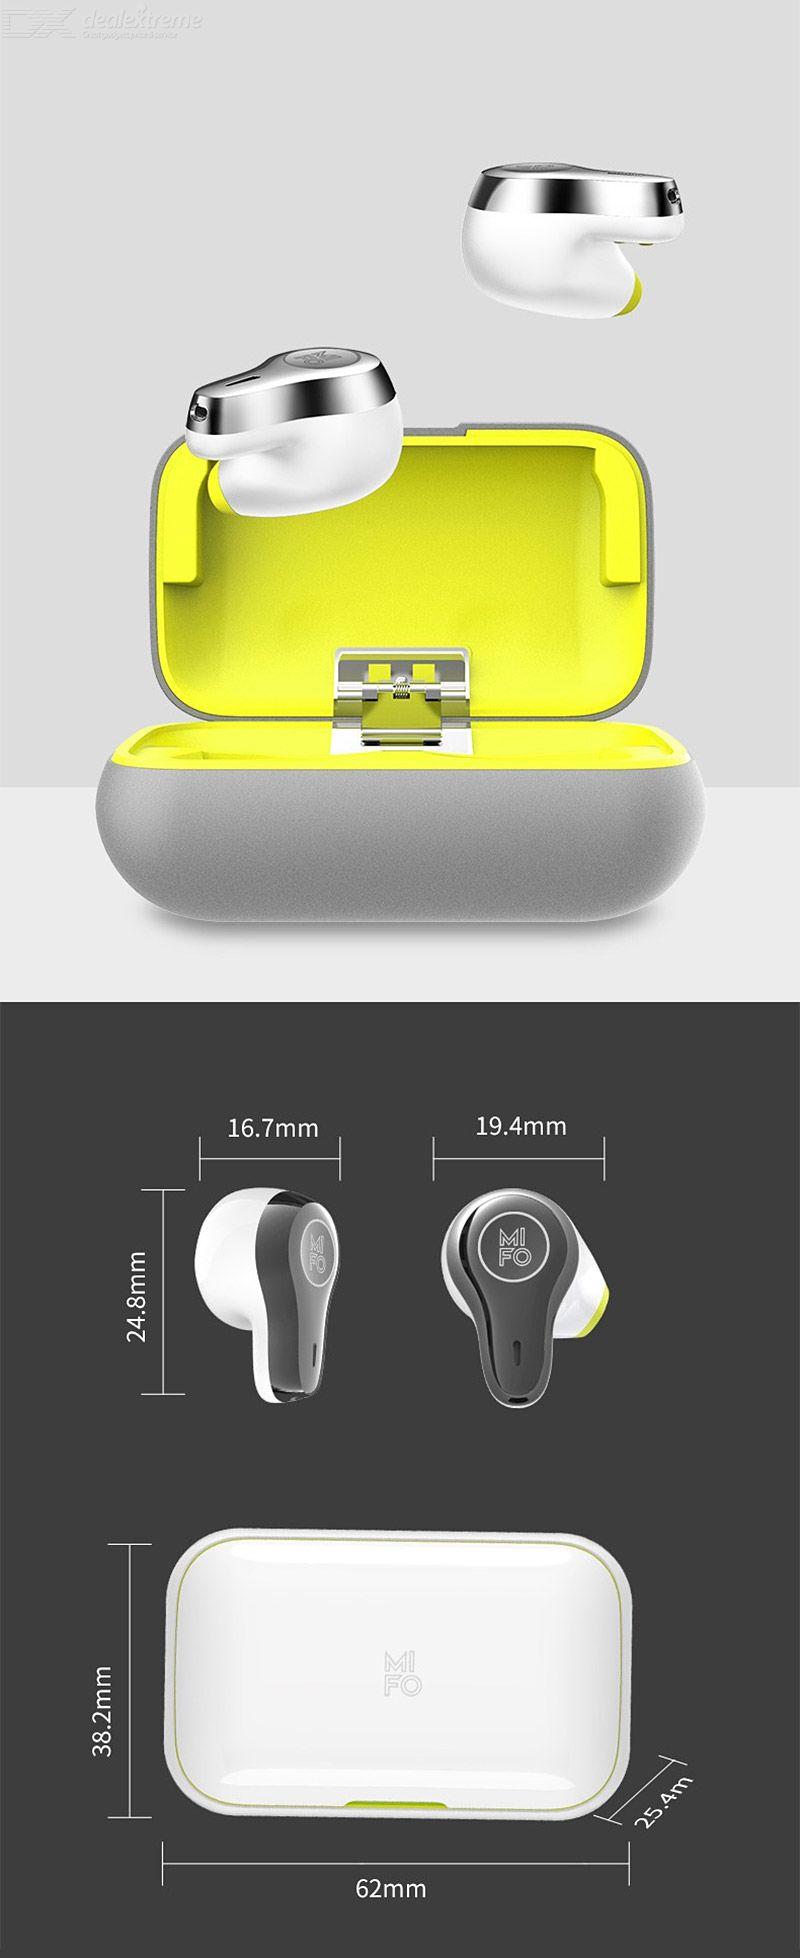 mifo wireless earbuds